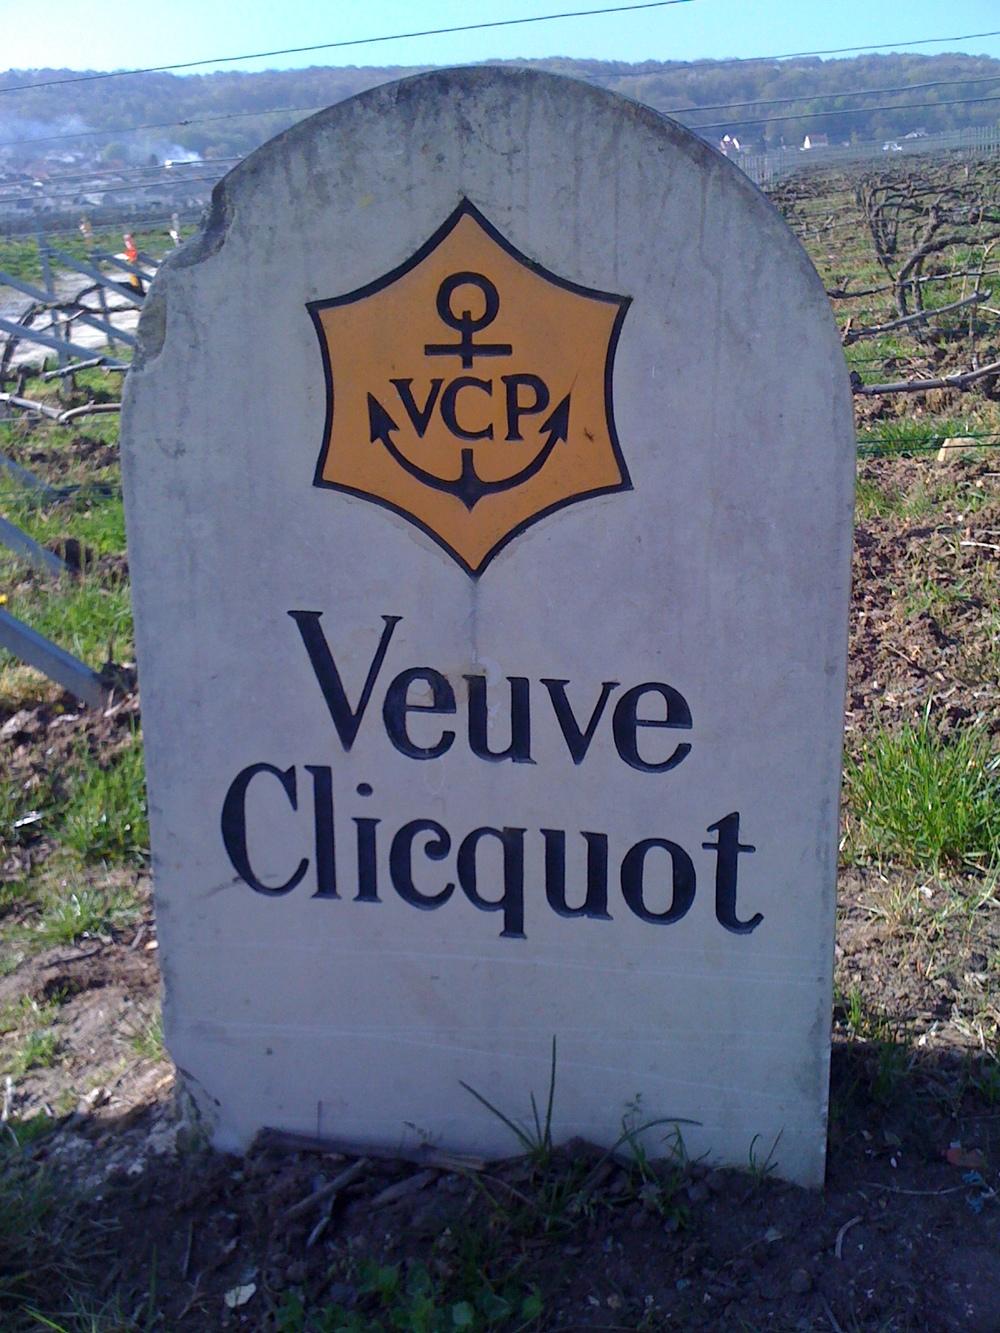 A vineyard marker for Veuve Clicquot Ponsardinin Champagne.